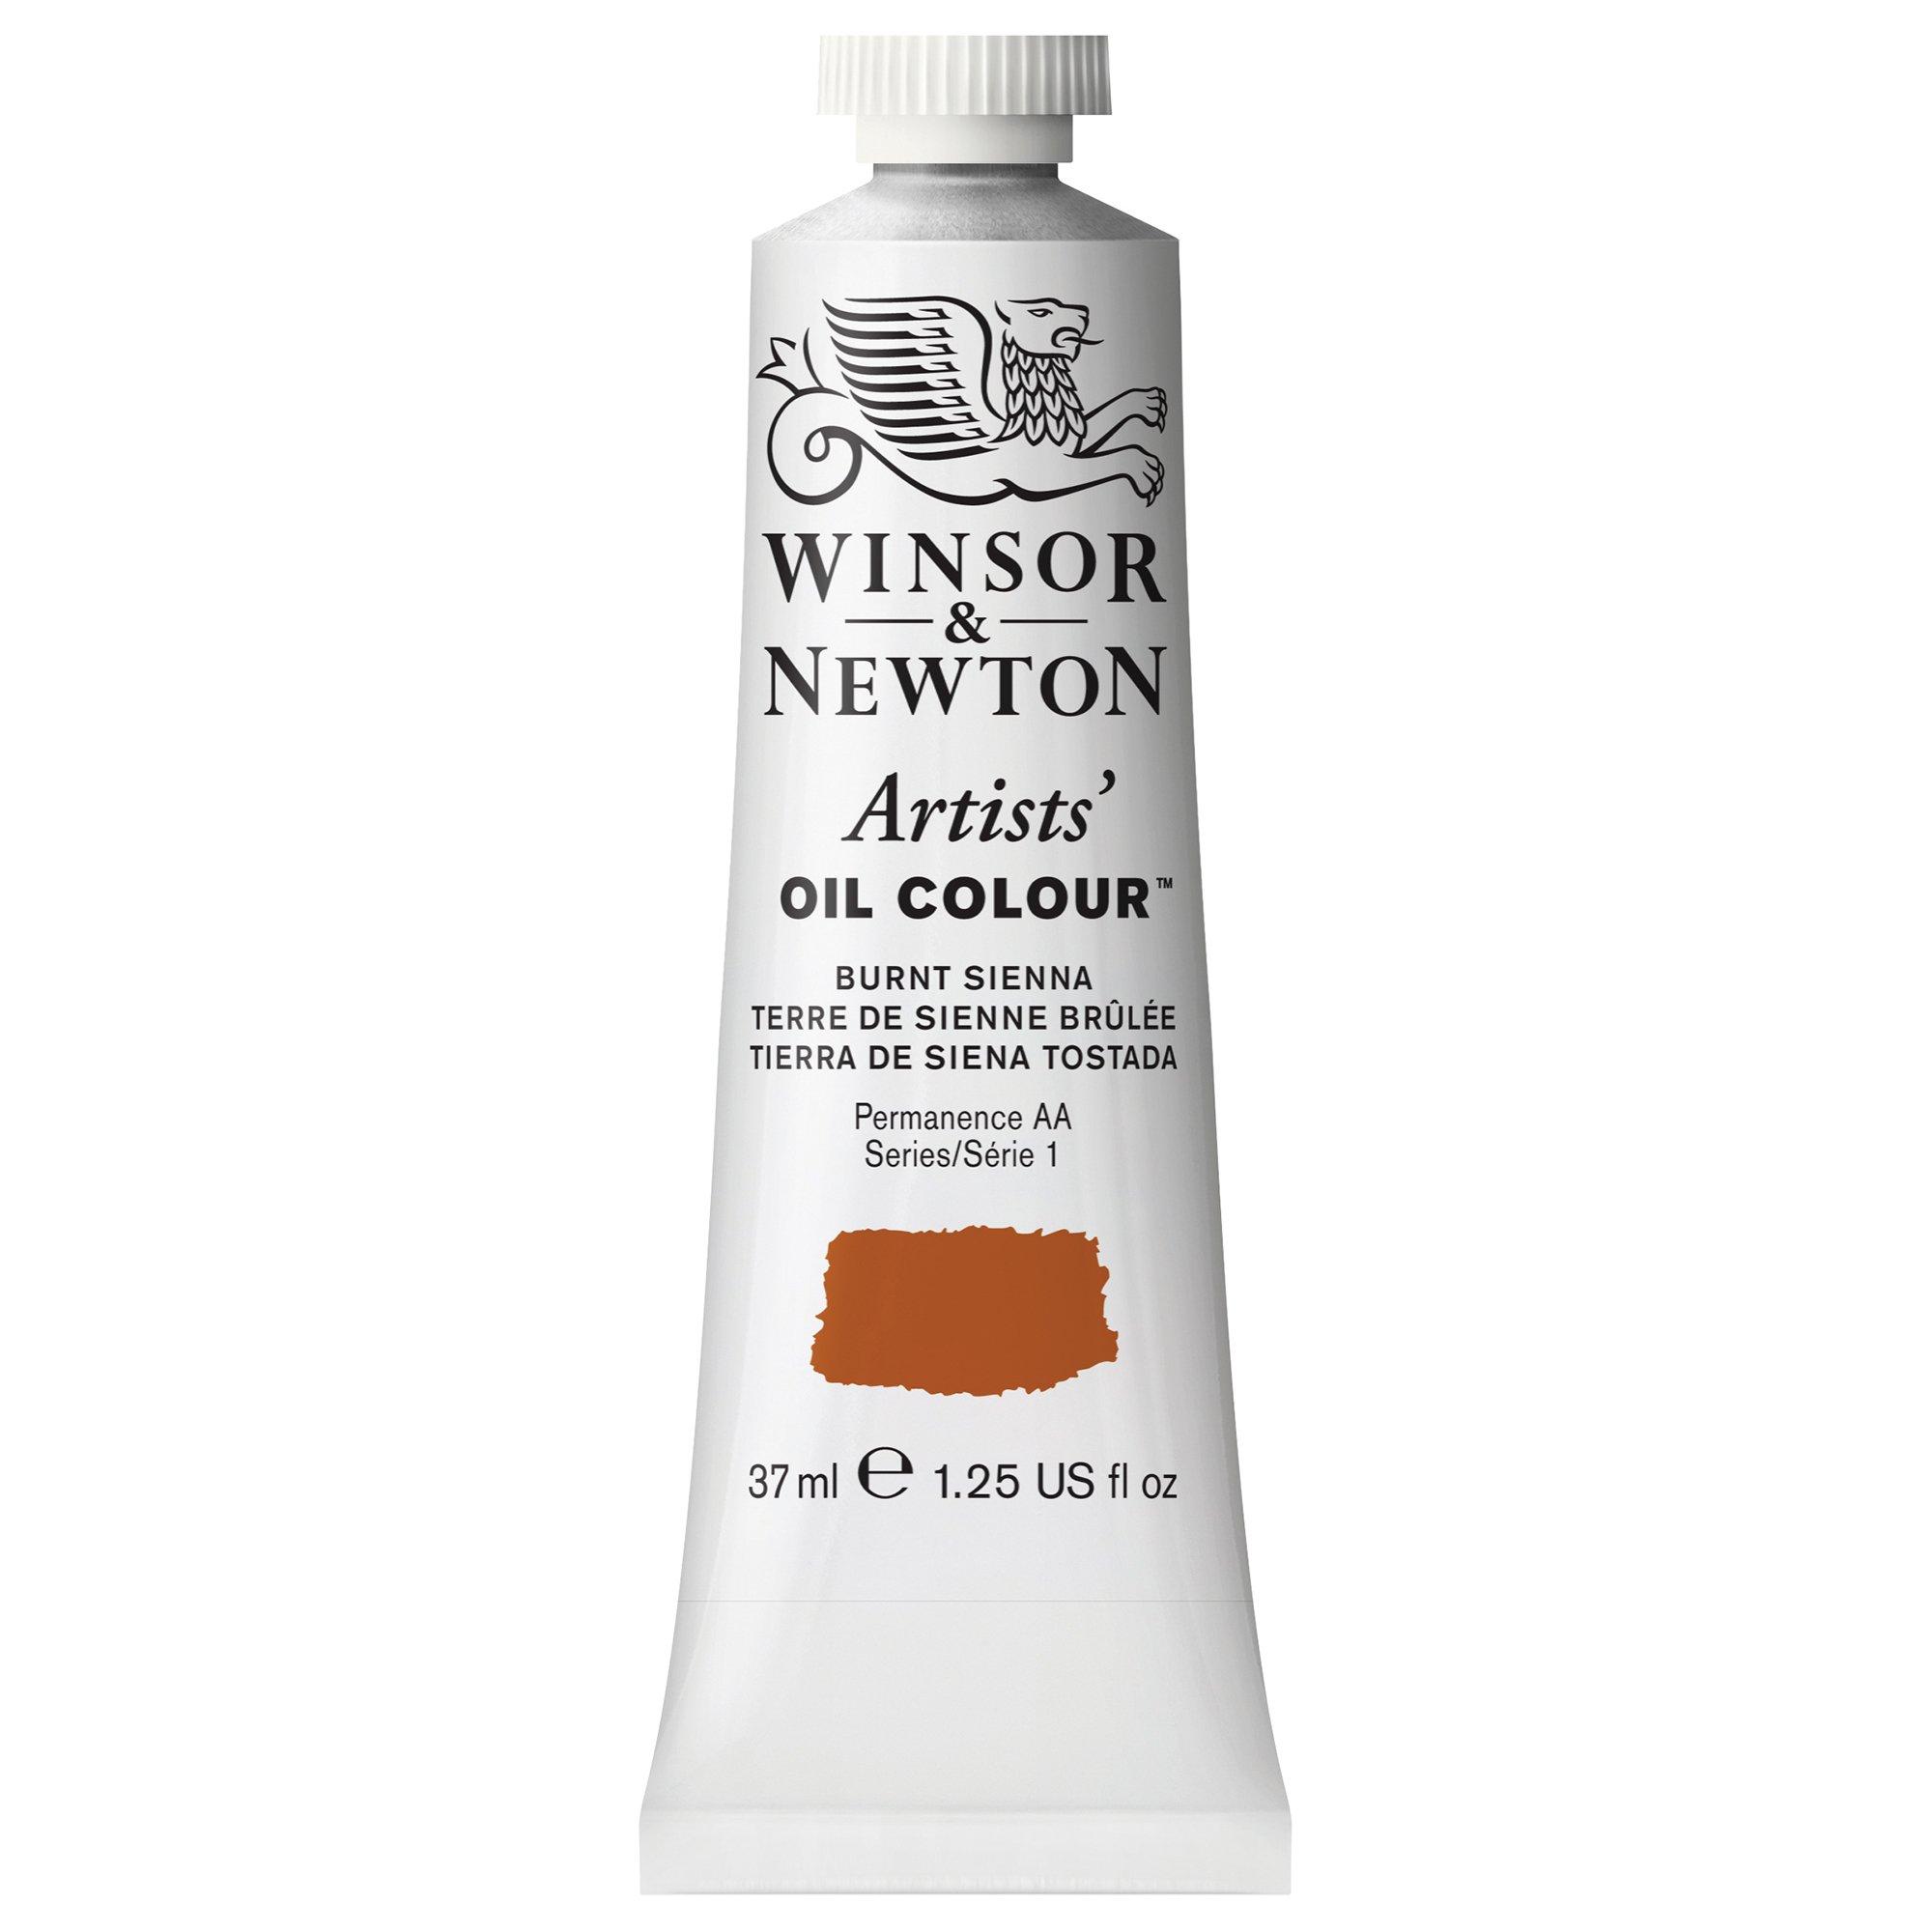 Winsor & Newton , Burnt Sienna Artists' Oil Colour Paint, 37ml Tube, 37-ml